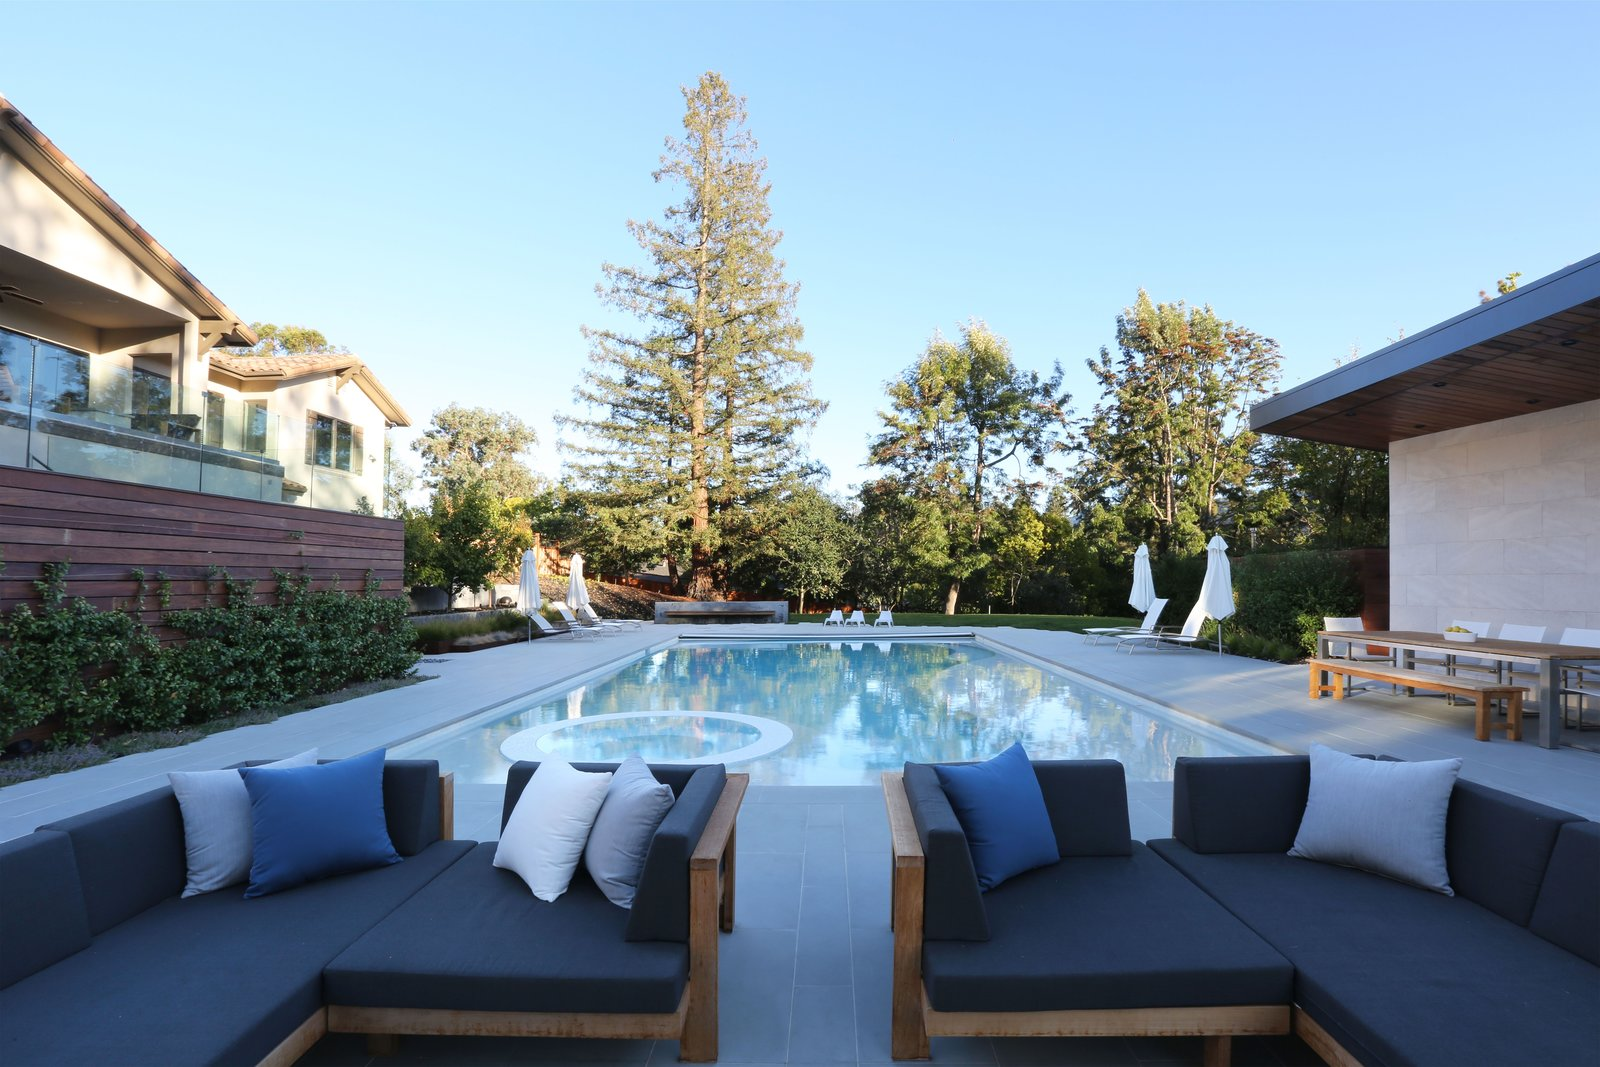 Pool Side Lounge Los Altos Hills Landscape by Greenblott Design